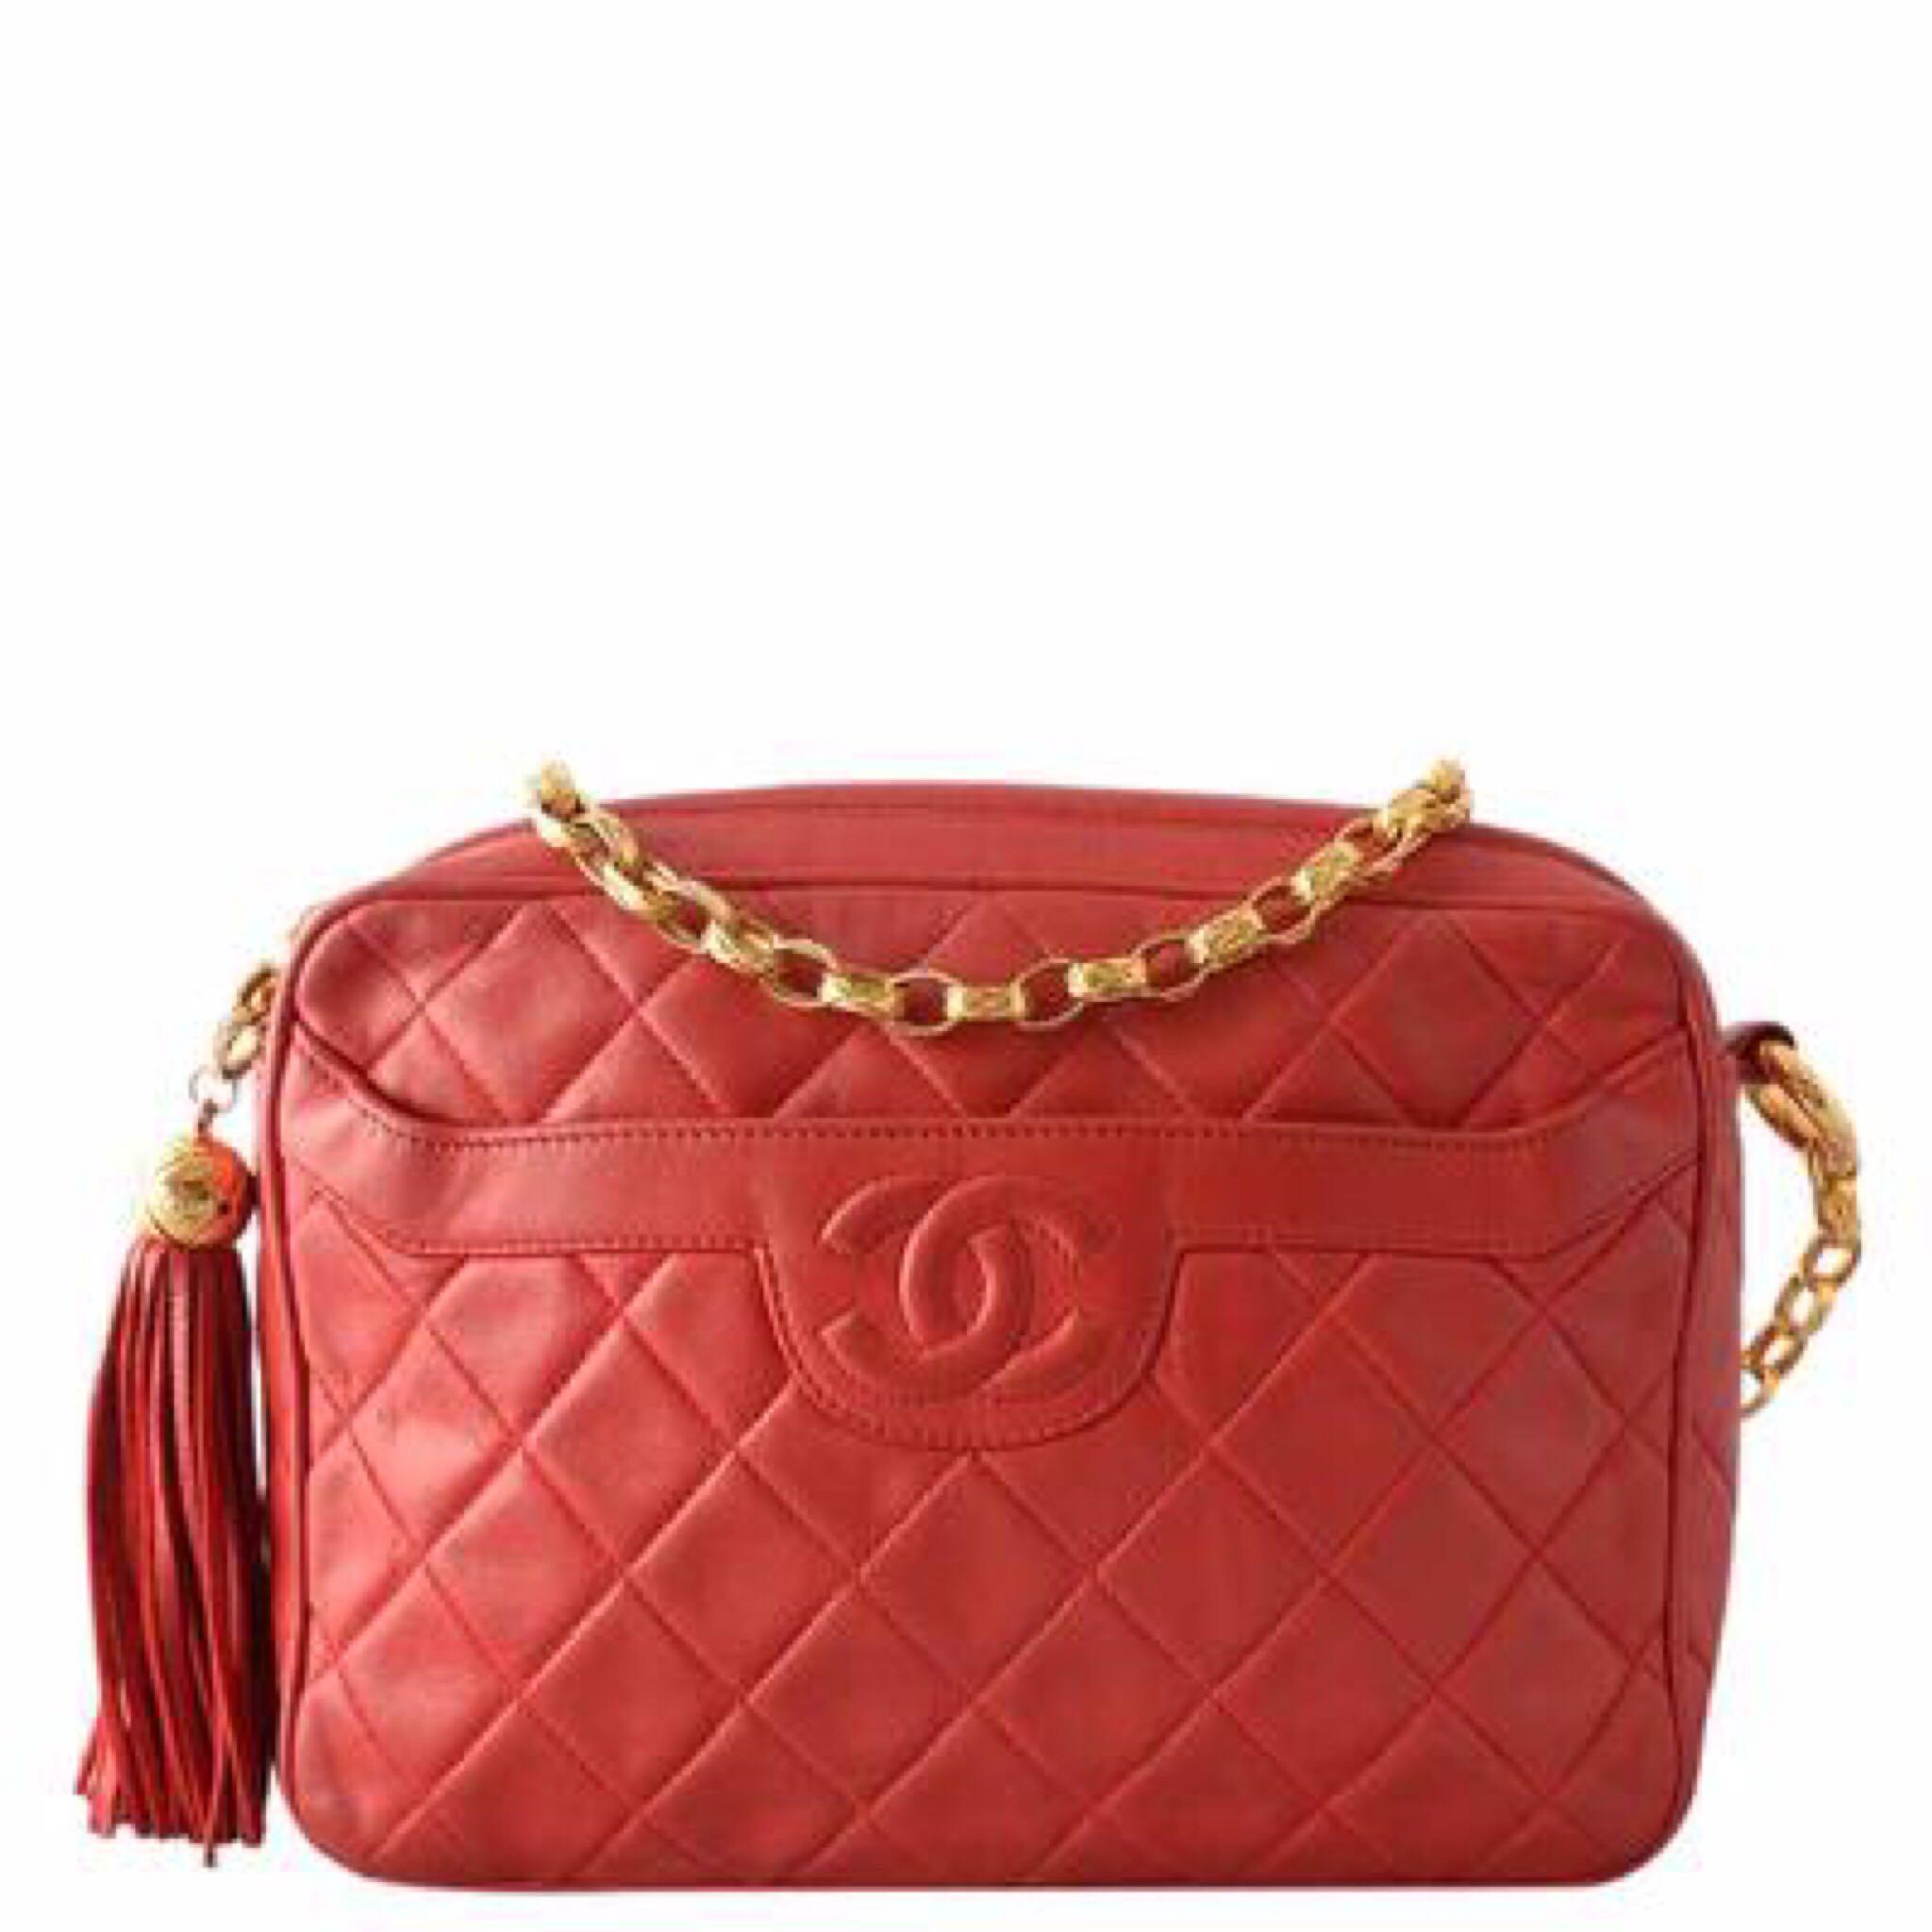 eee0b4d4a7b5 Vintage Chanel Quilted Lambskin Camera Bag w/ Tassel GHW, Luxury, Bags &  Wallets, Handbags on Carousell